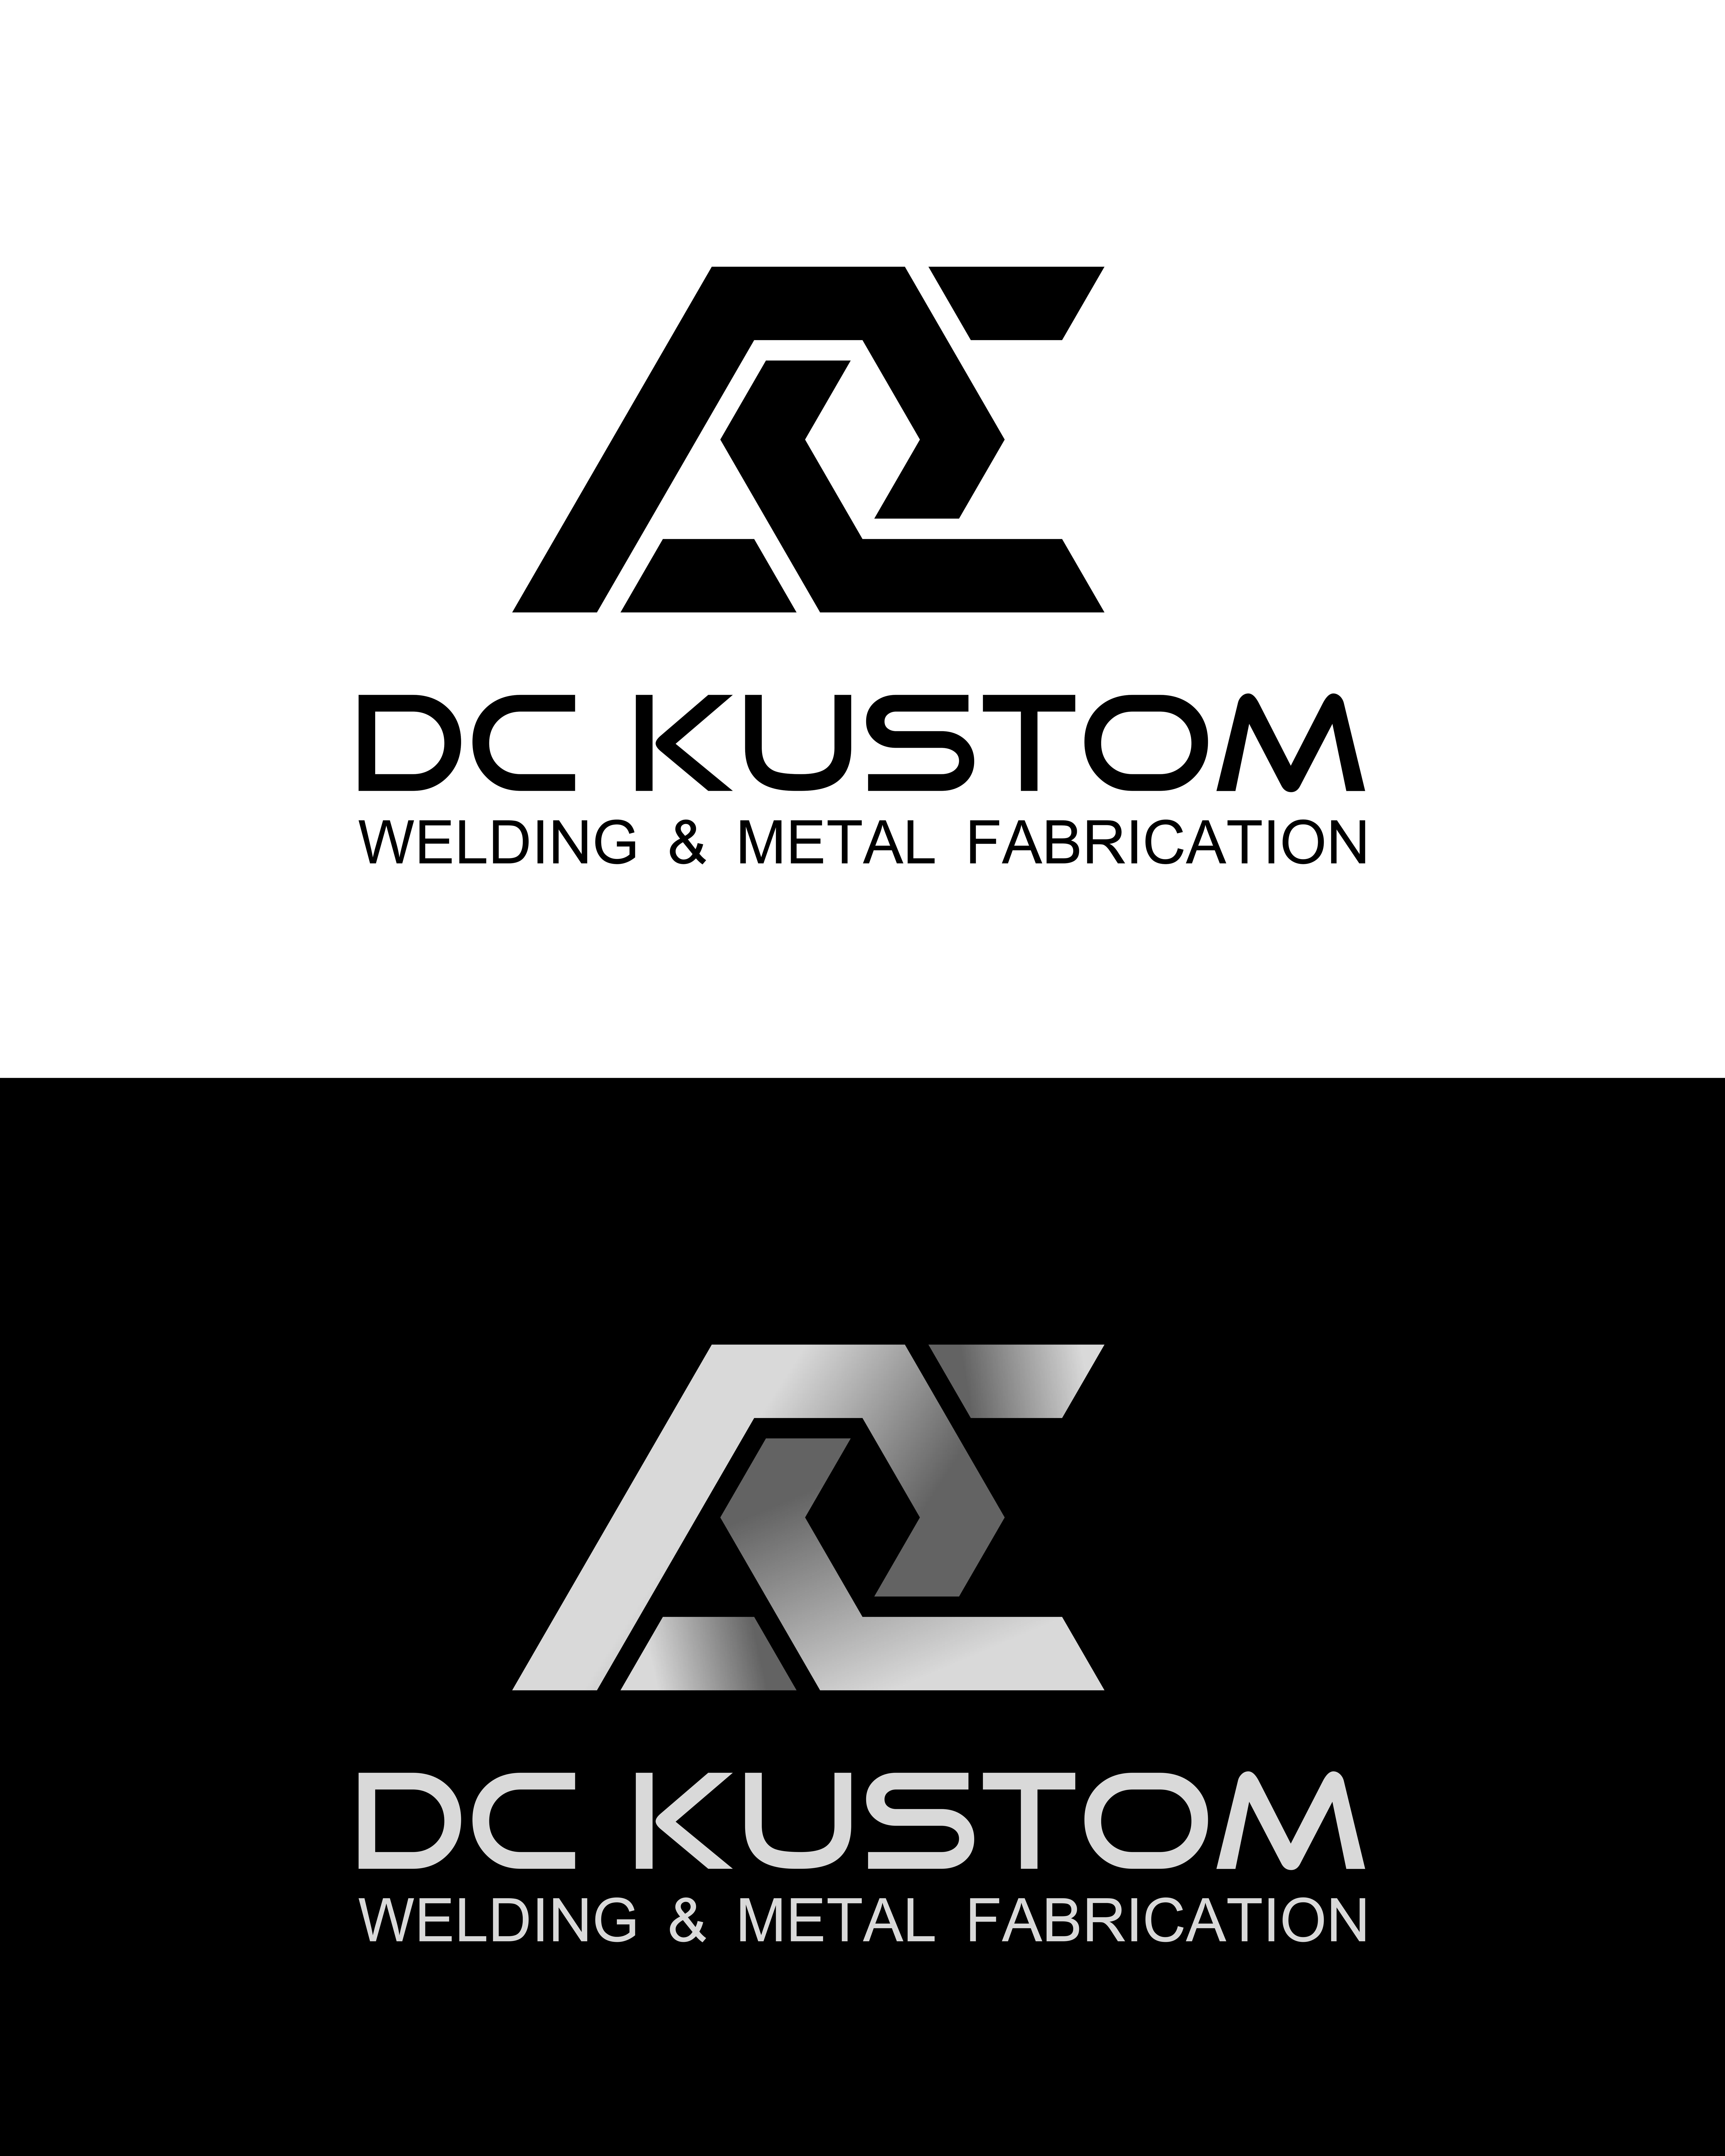 Logo Design by Net Bih - Entry No. 83 in the Logo Design Contest Imaginative Logo Design for DC KUSTOM WELDING & METAL FABRICATION.